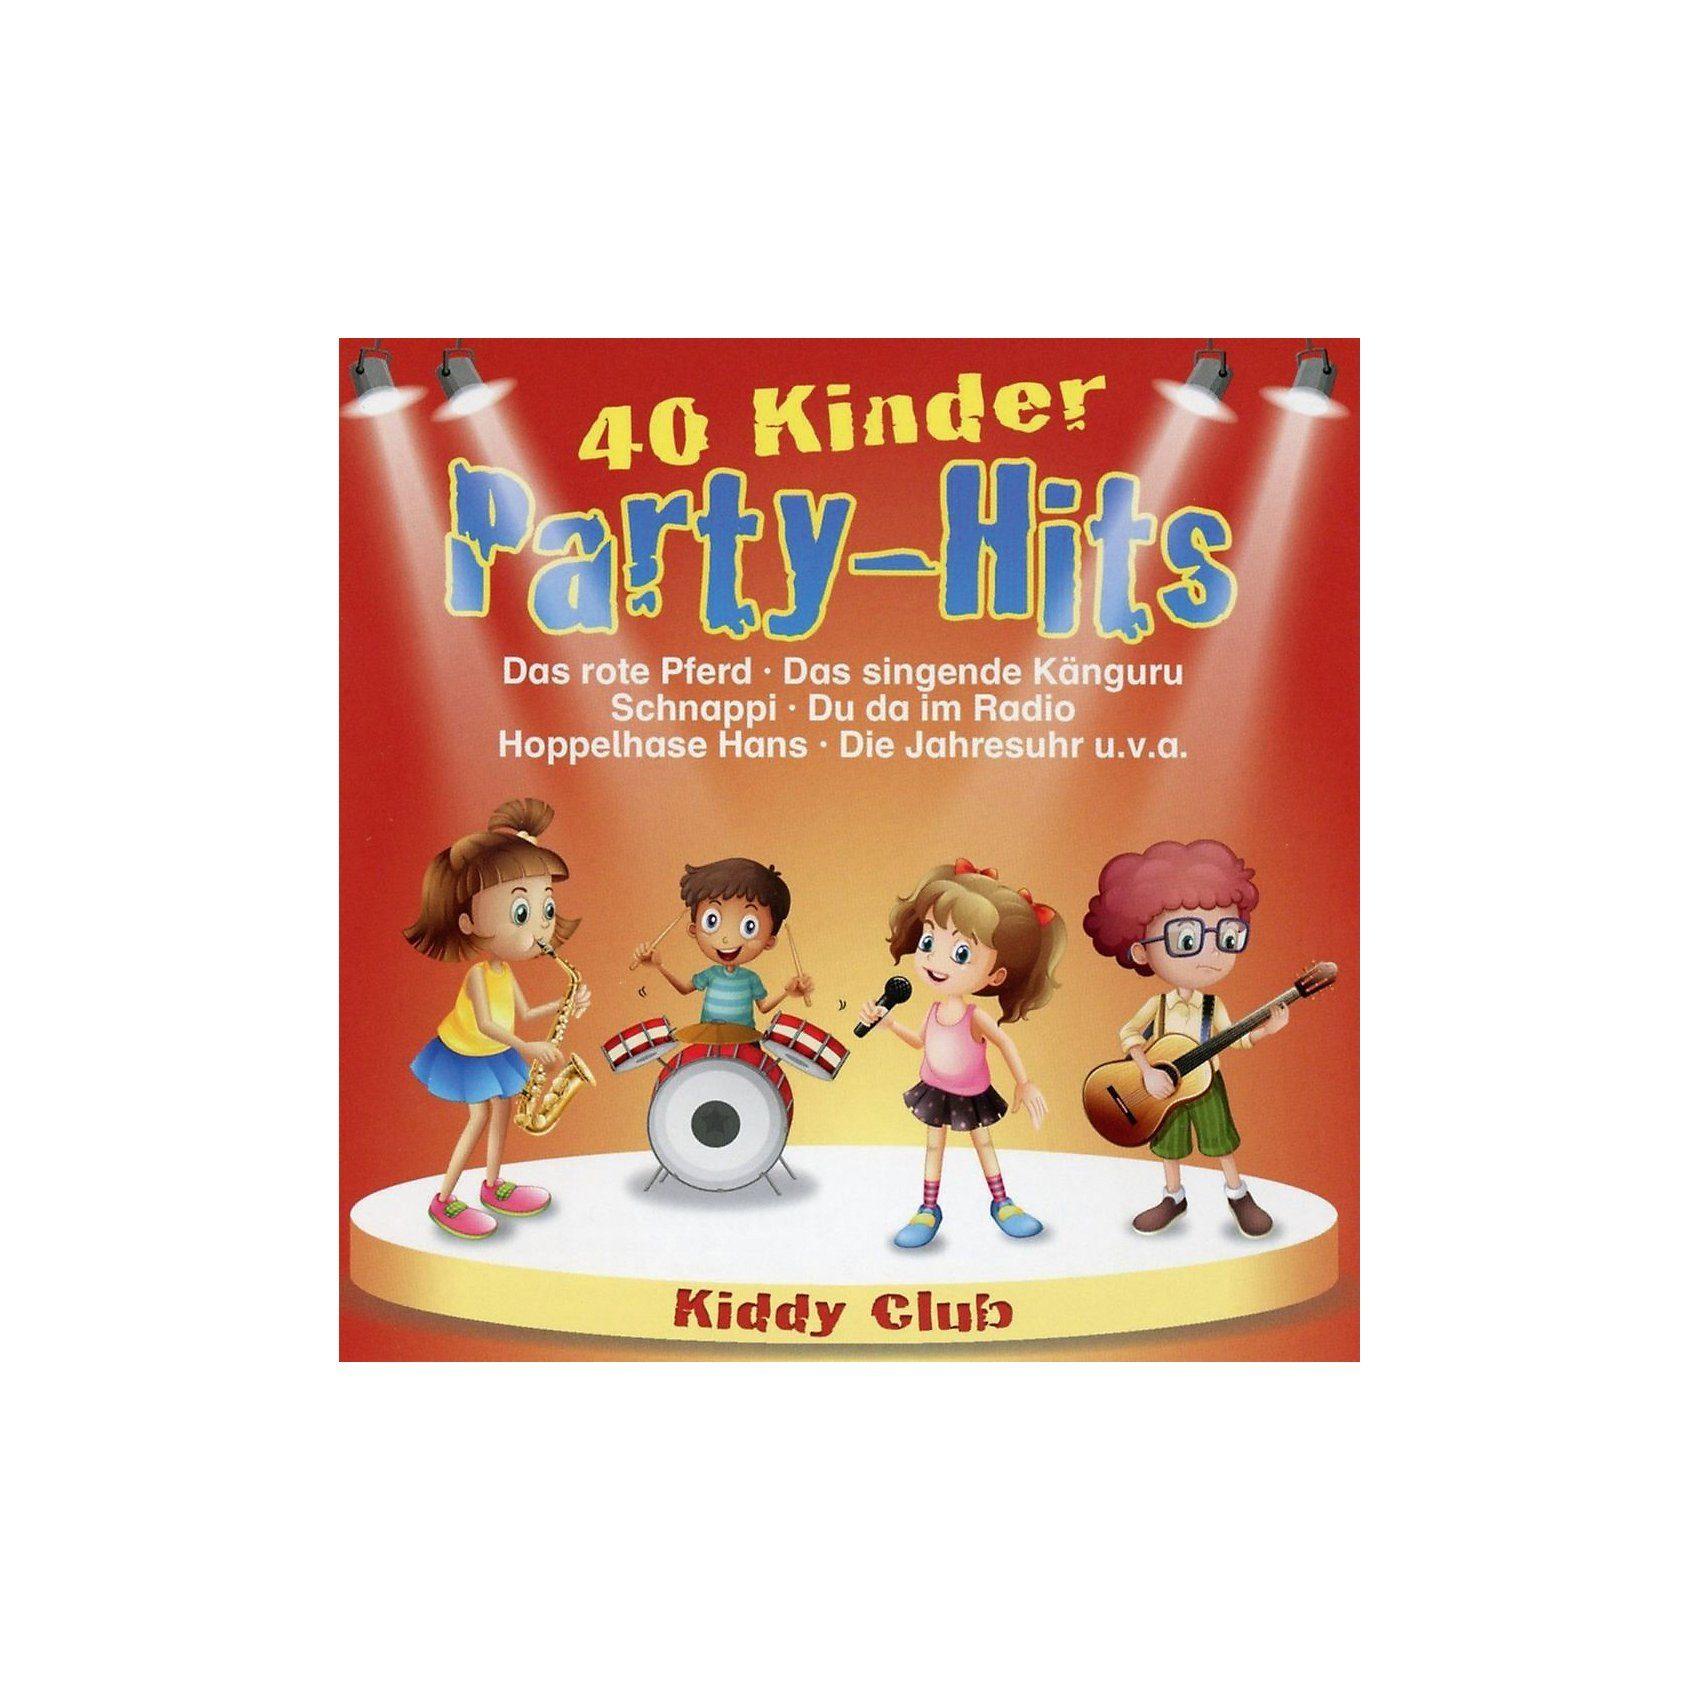 CD Kiddy Club - 40 Kinder Party Hits